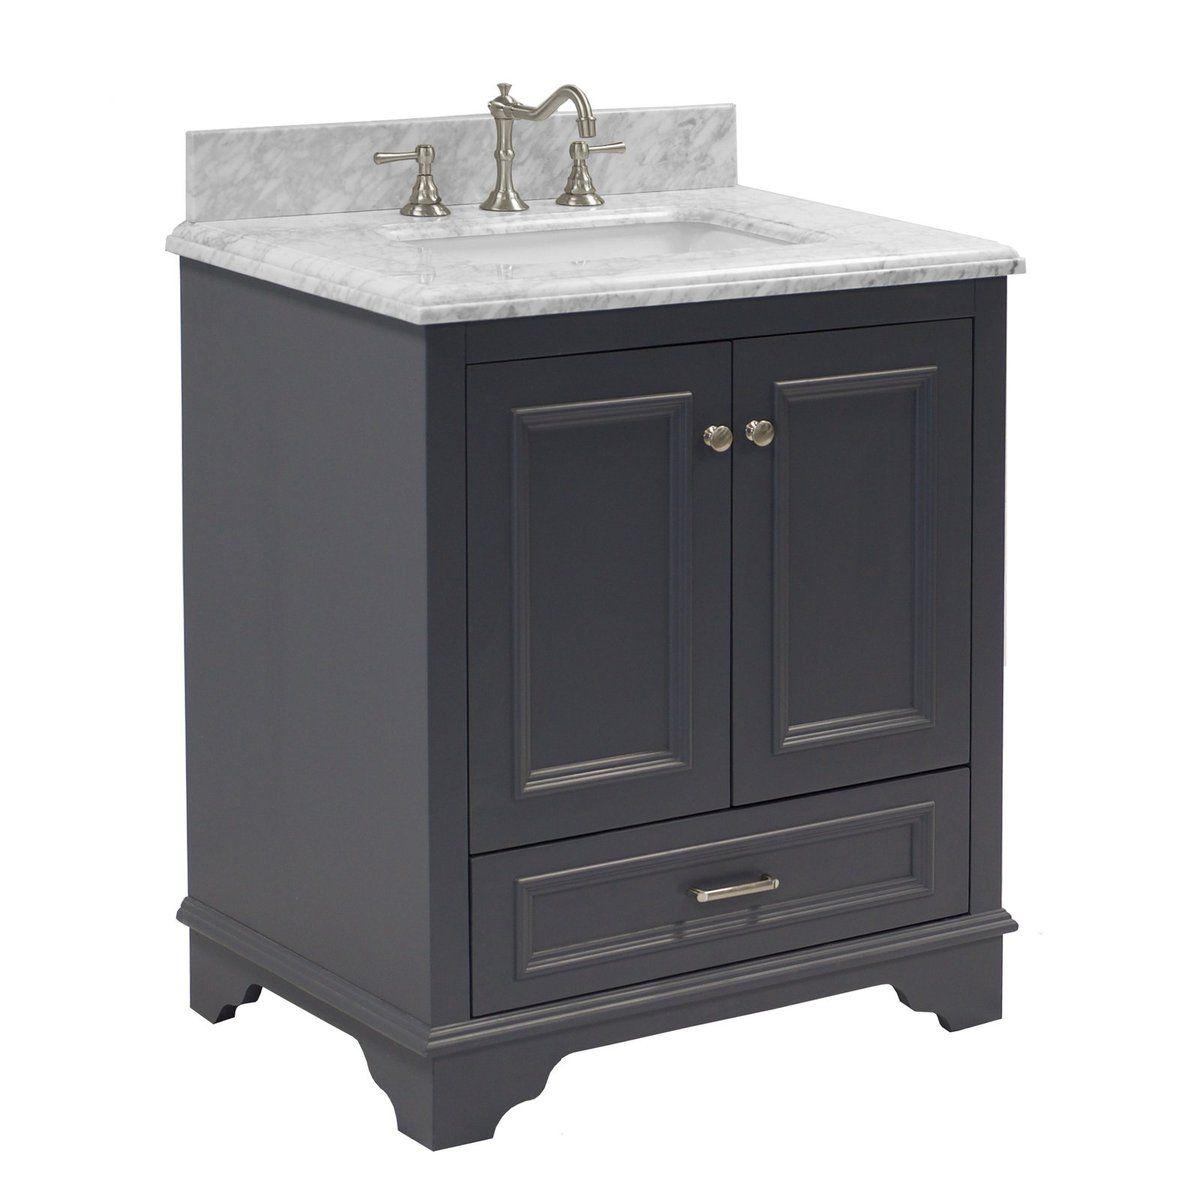 Nantucket 30 Inch Vanity With Carrara Marble Top In 2021 30 Inch Bathroom Vanity 30 Inch Vanity Single Bathroom Vanity